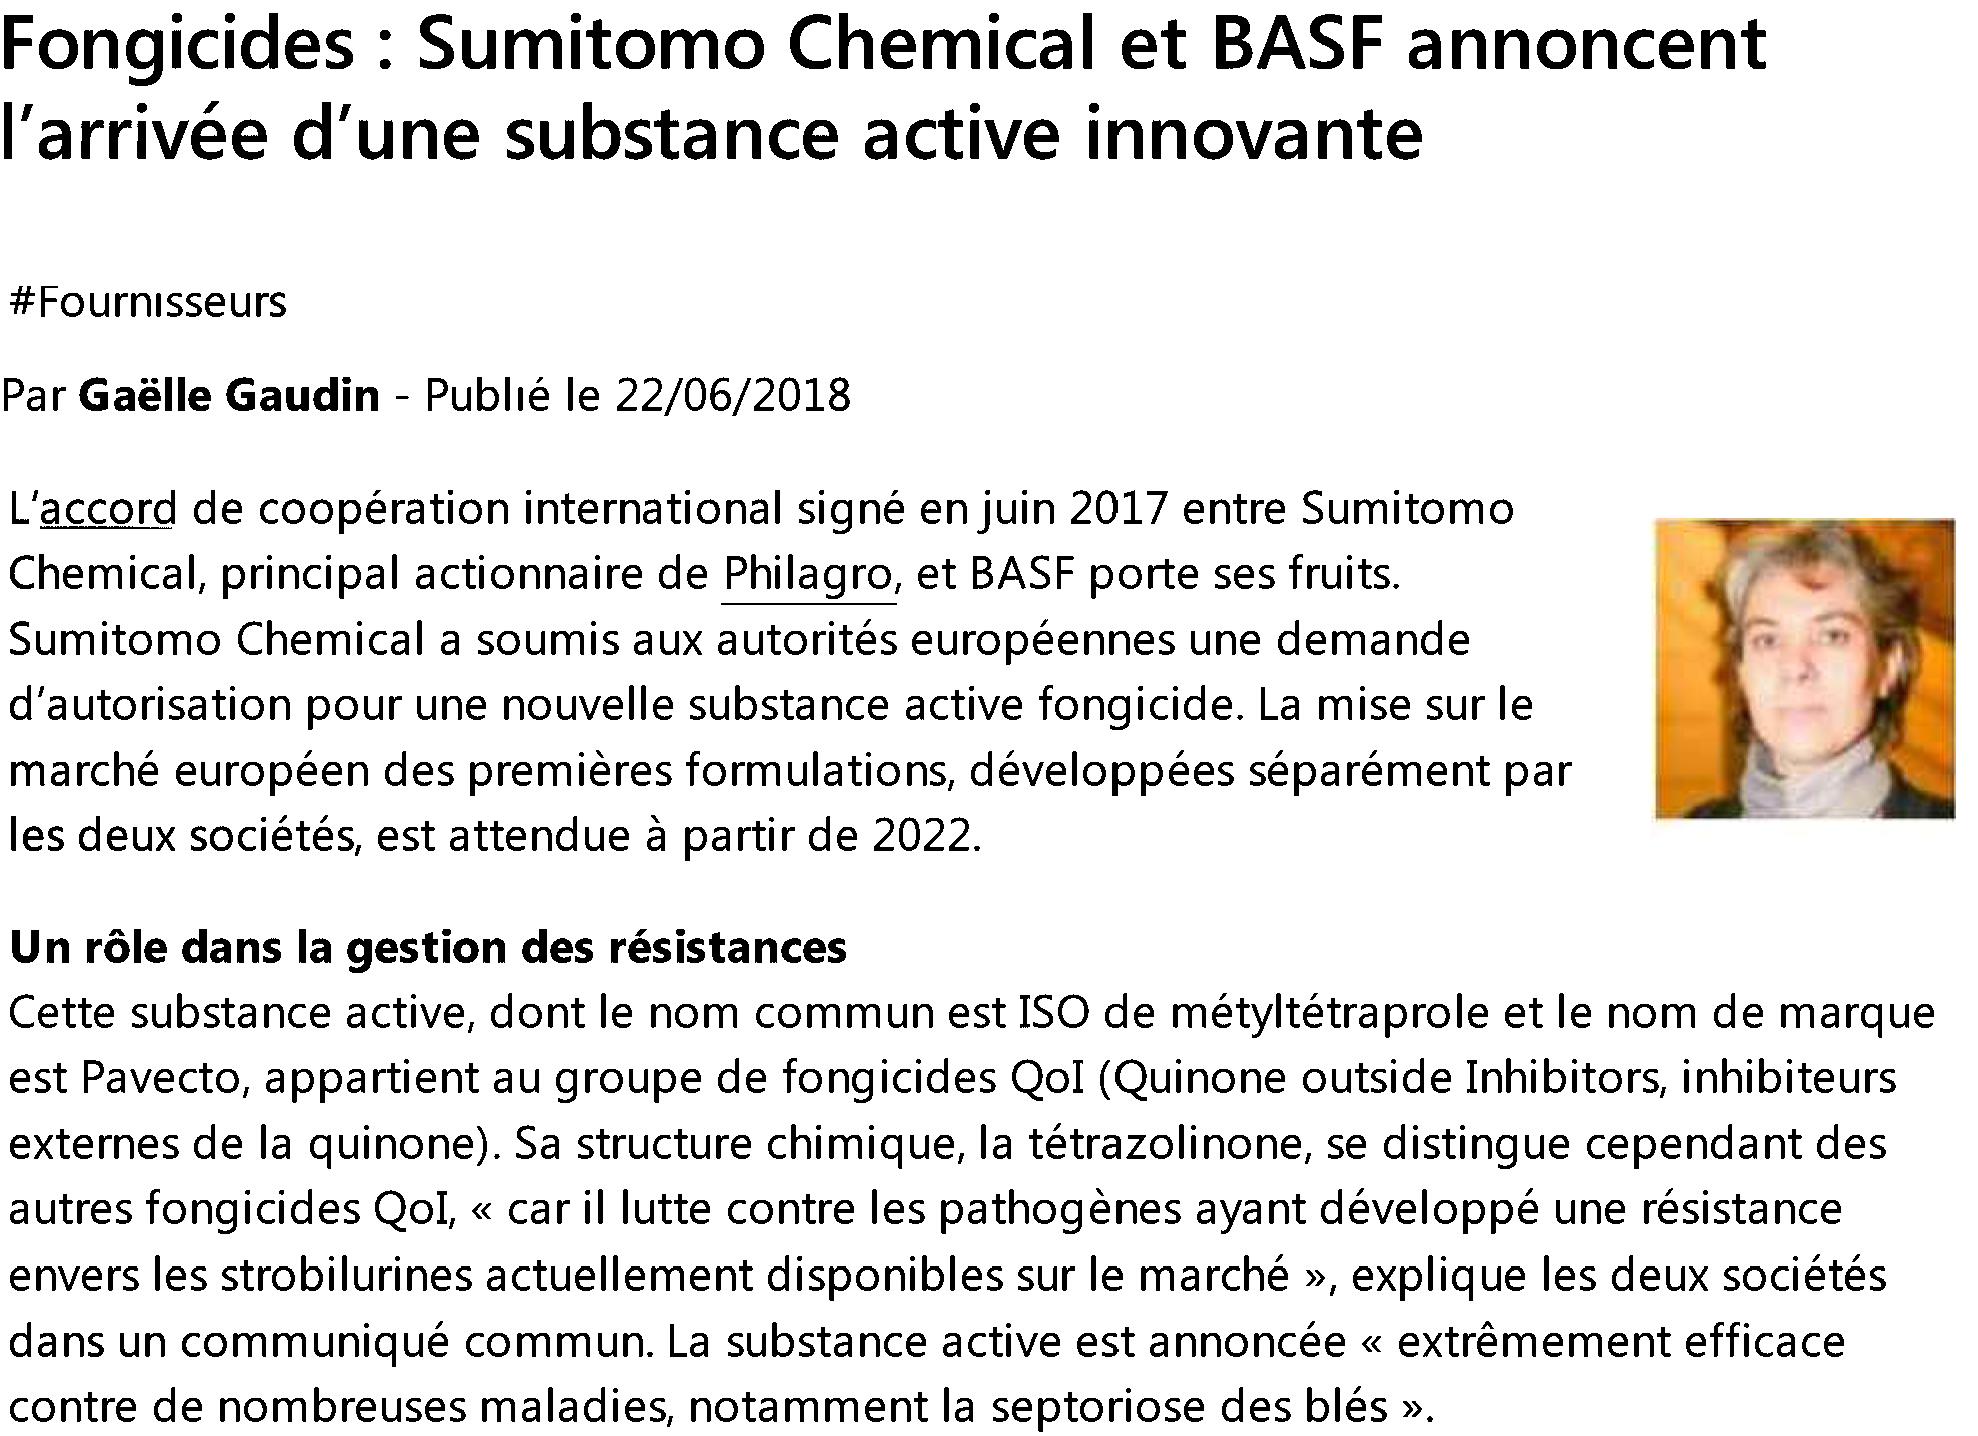 SCC_BASF_PAVECTO_Reference appro_20180625